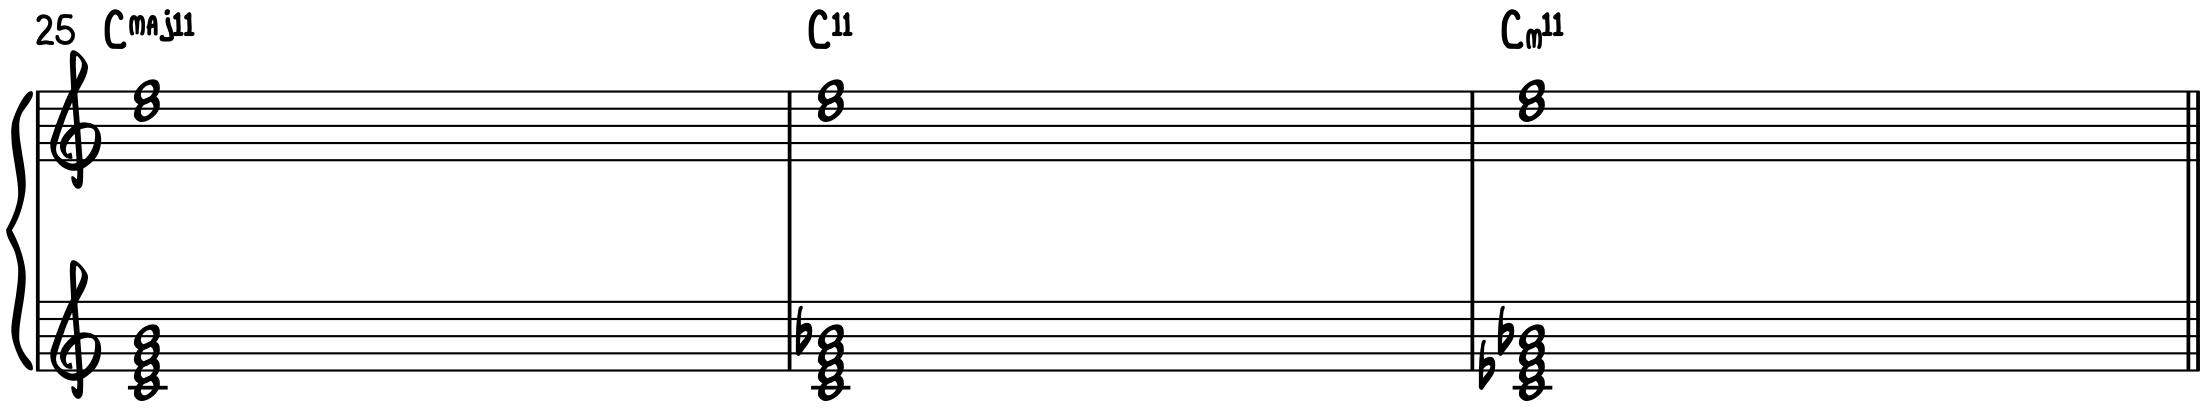 11th Chords